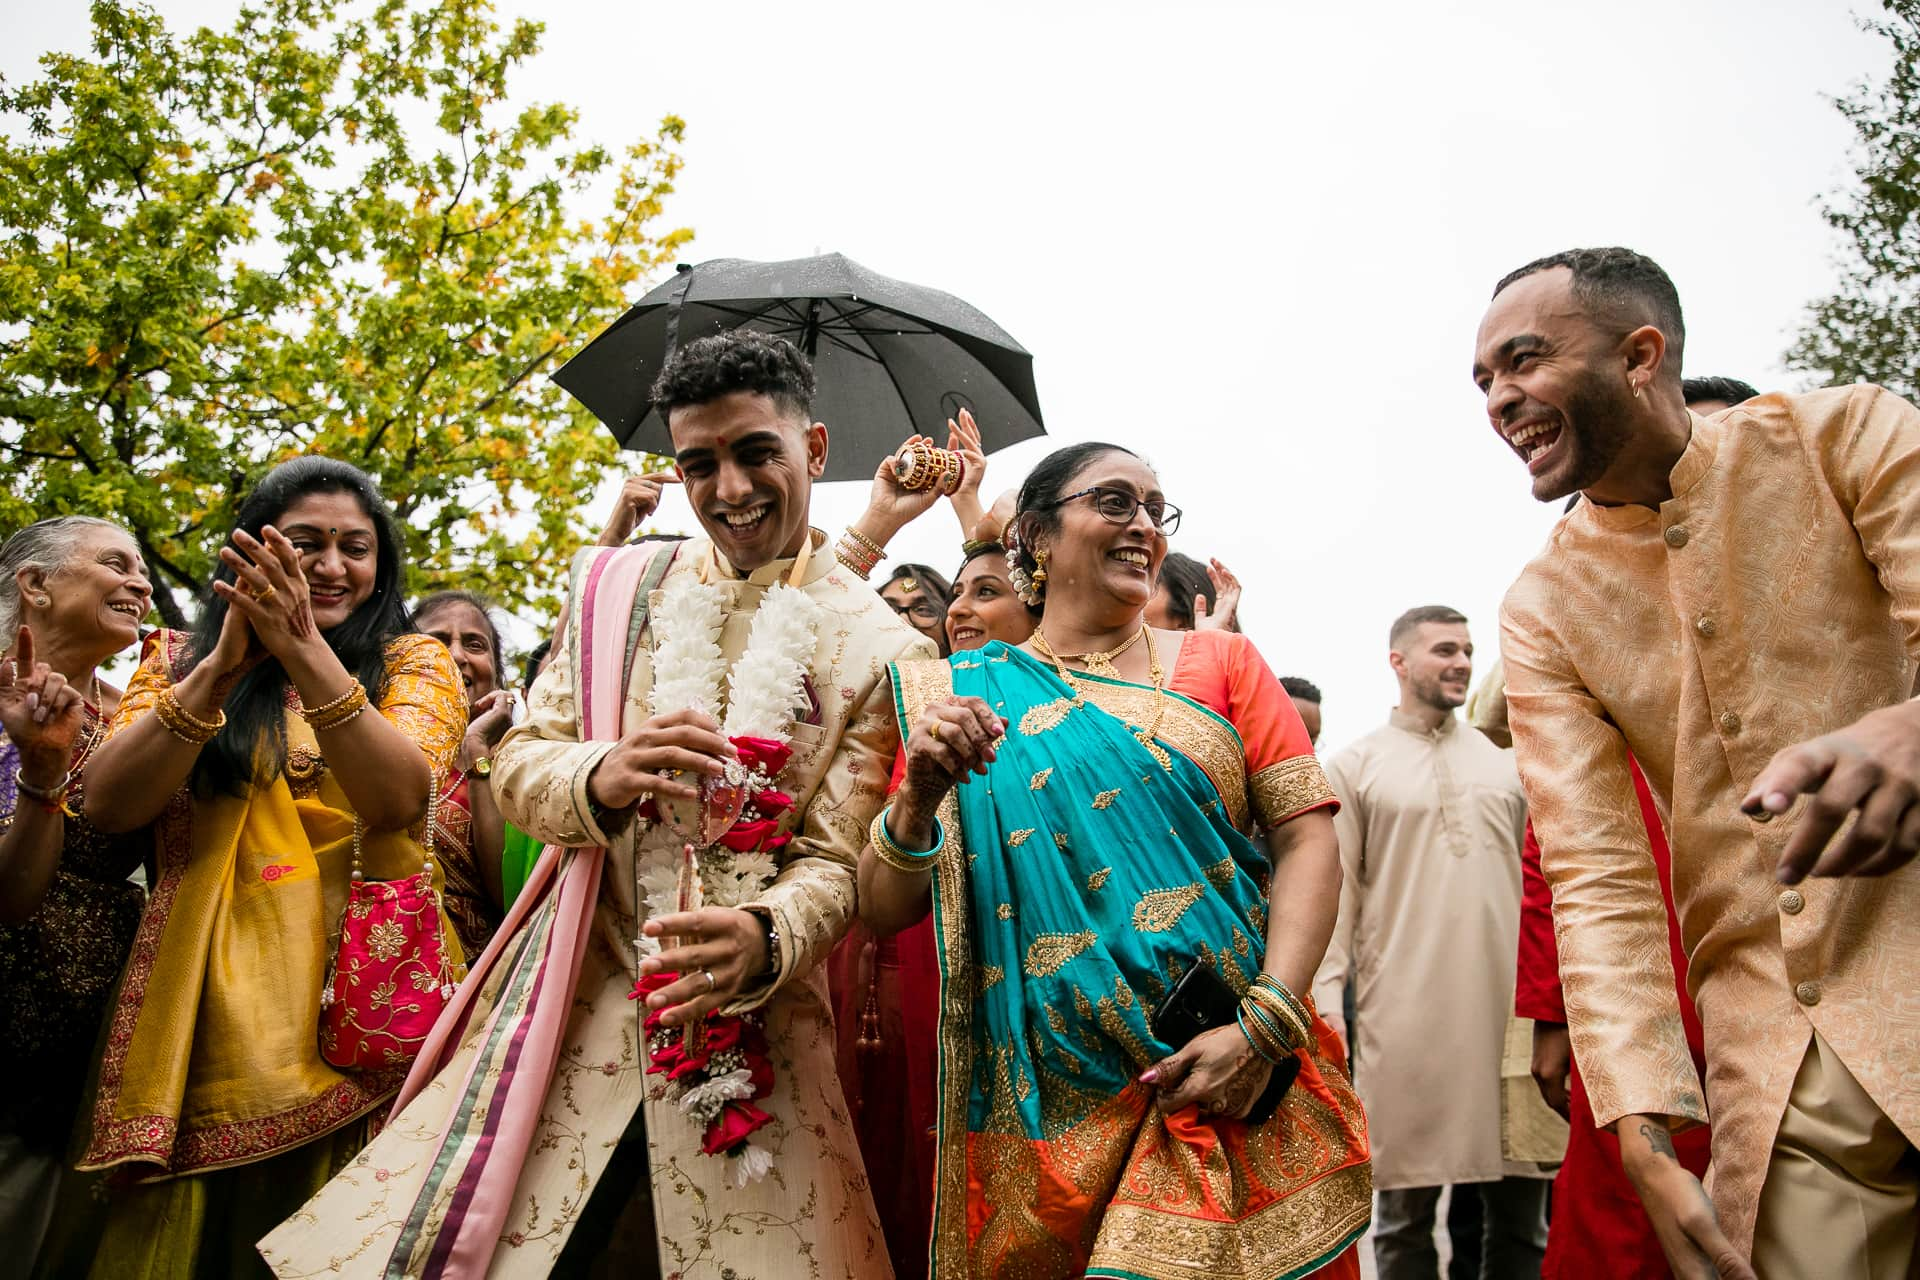 Asian wedding grooms' arrival